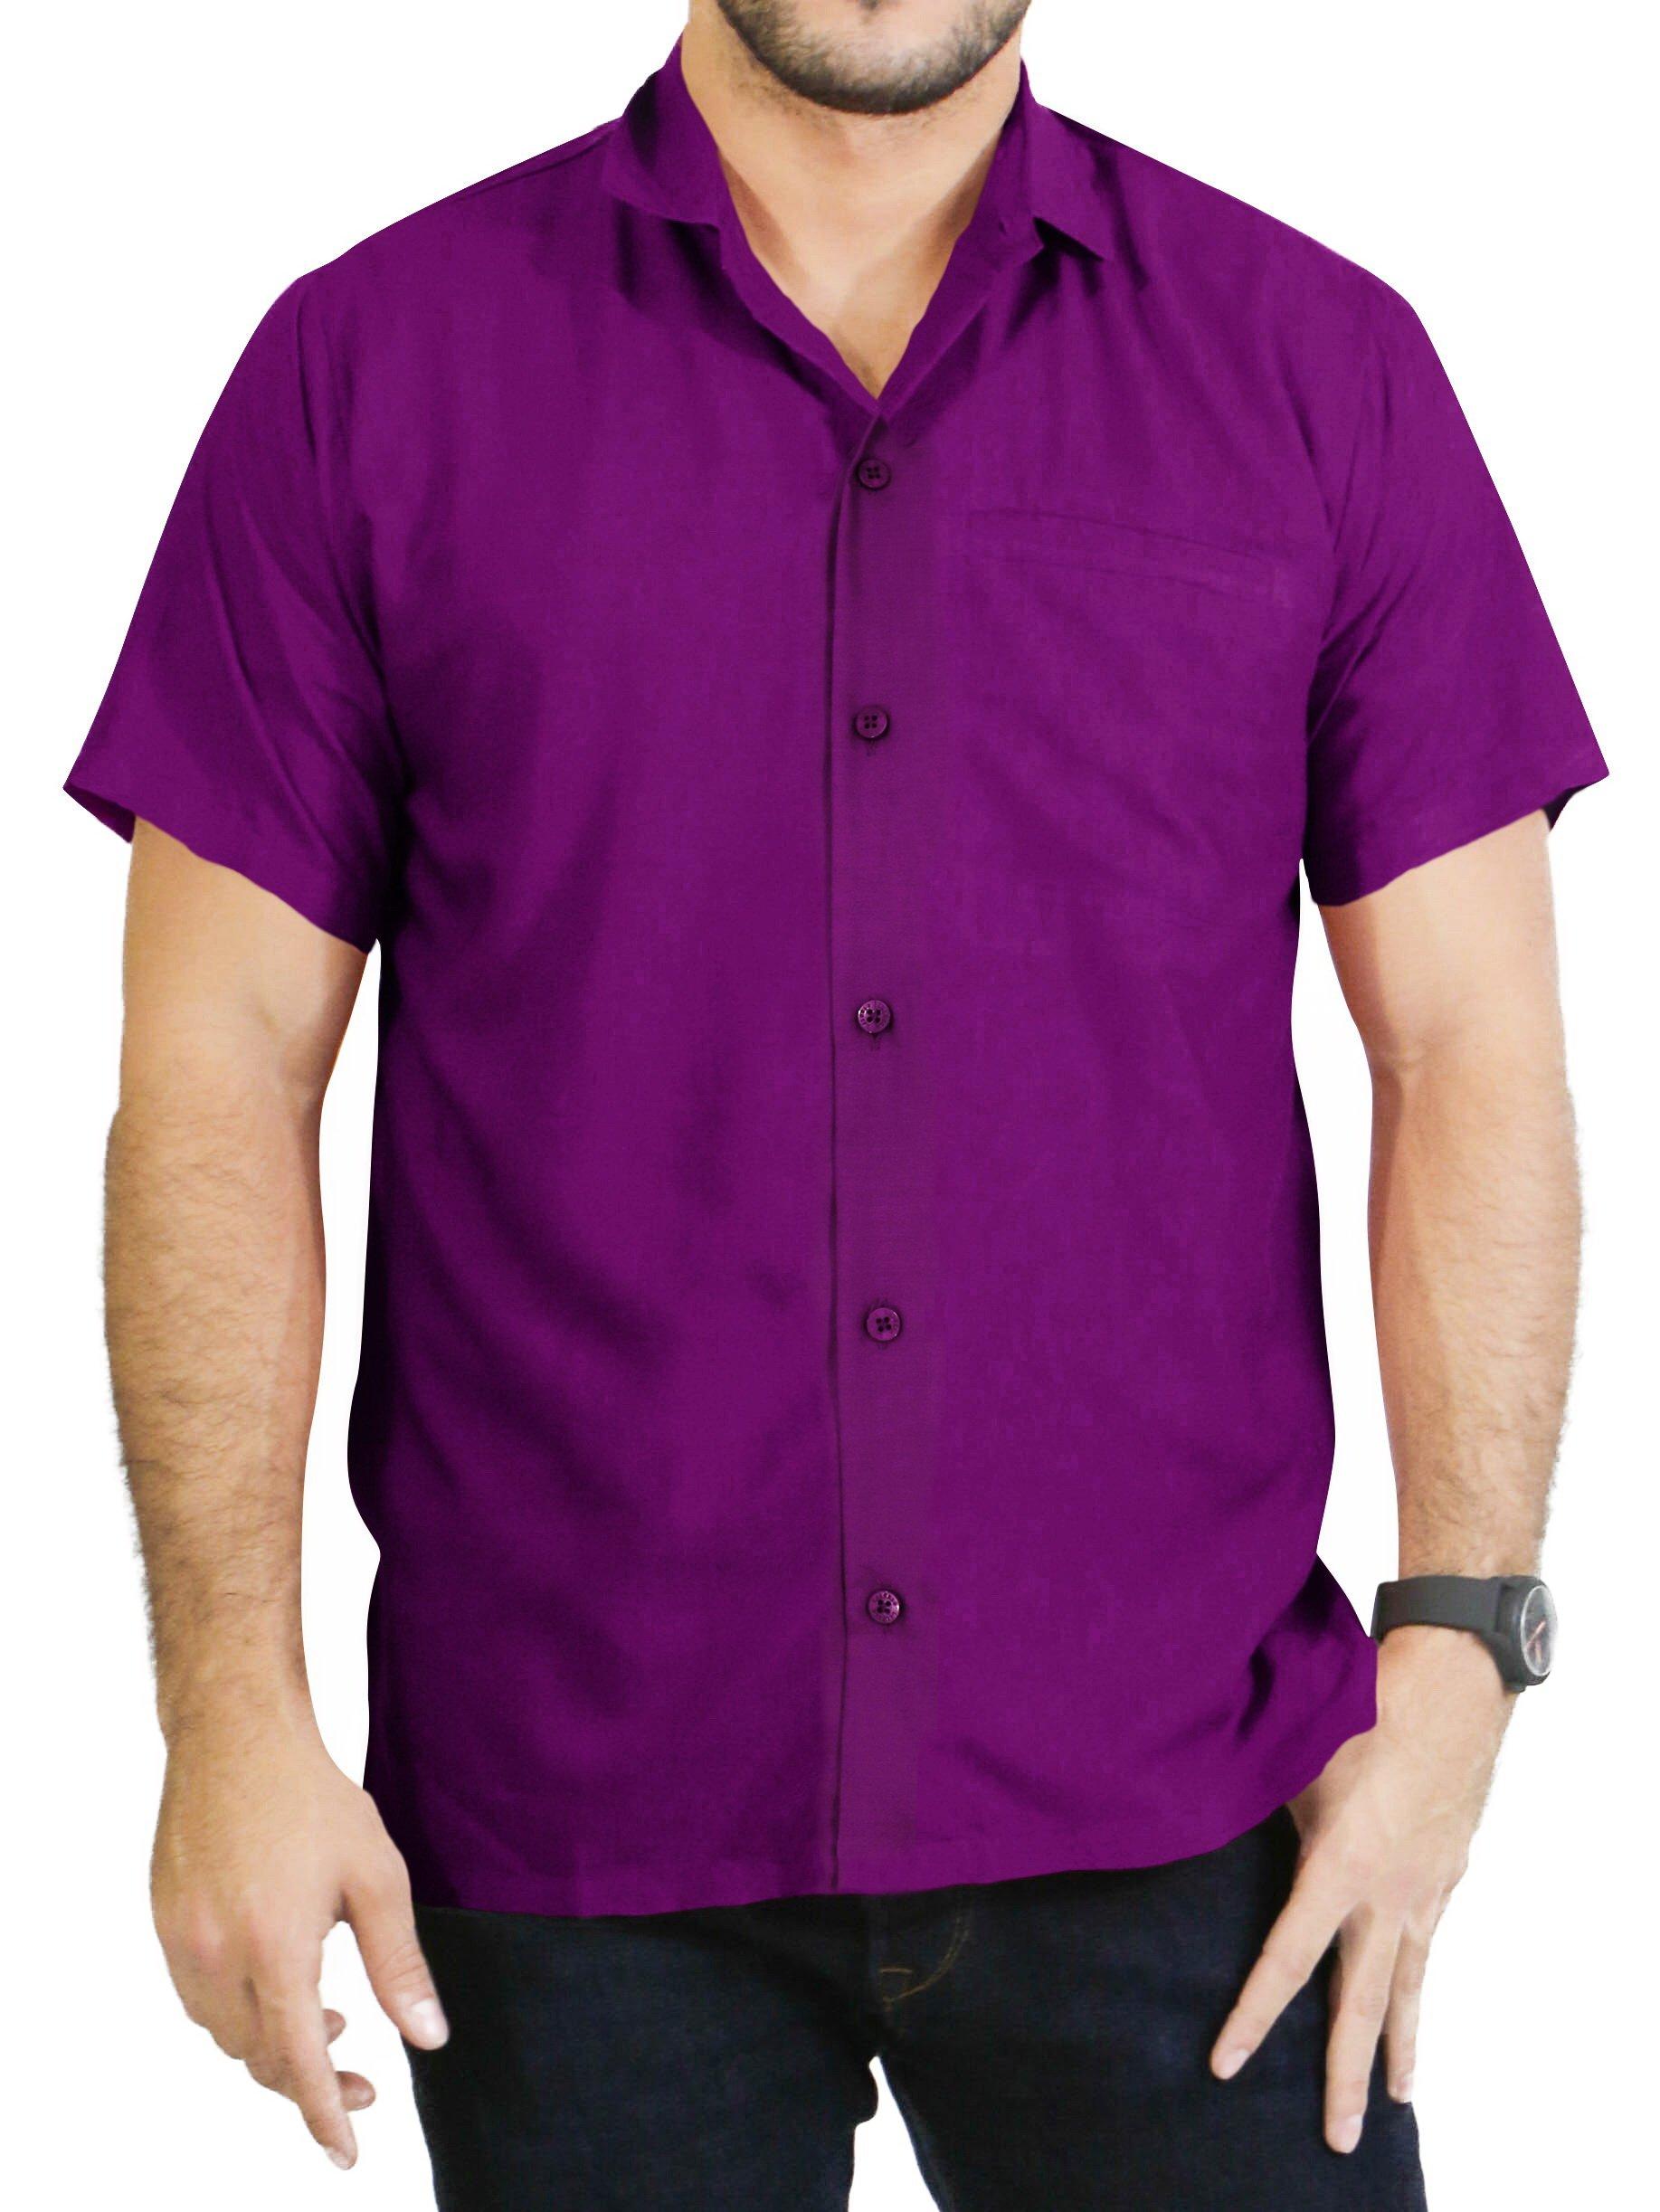 LA LEELA Rayon Beach Luau Vacation Dress Shirt Violet 2XL |Chest 54'' - 59'' by LA LEELA